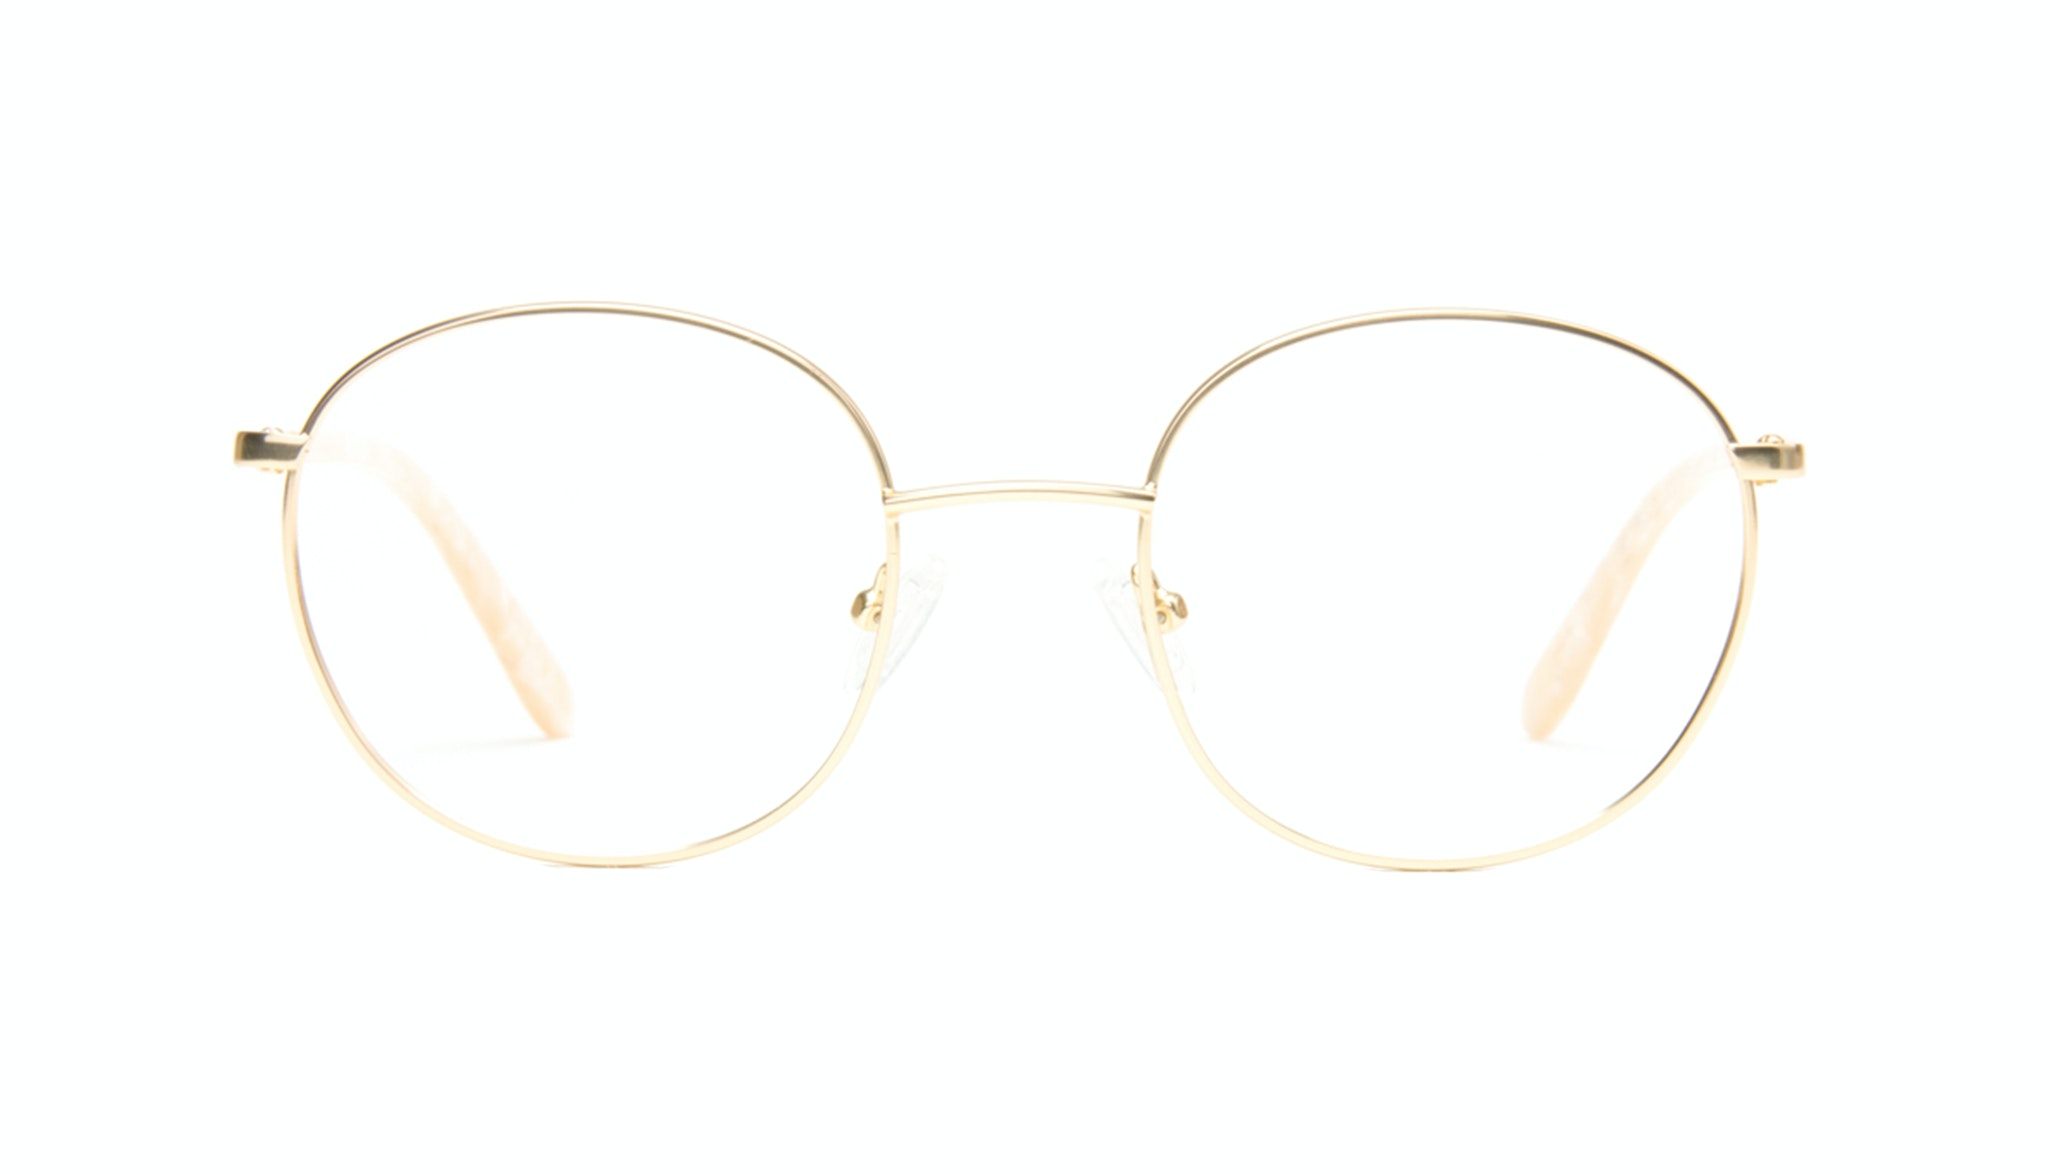 Affordable Fashion Glasses Round Eyeglasses Women Joy Gold Marble Front